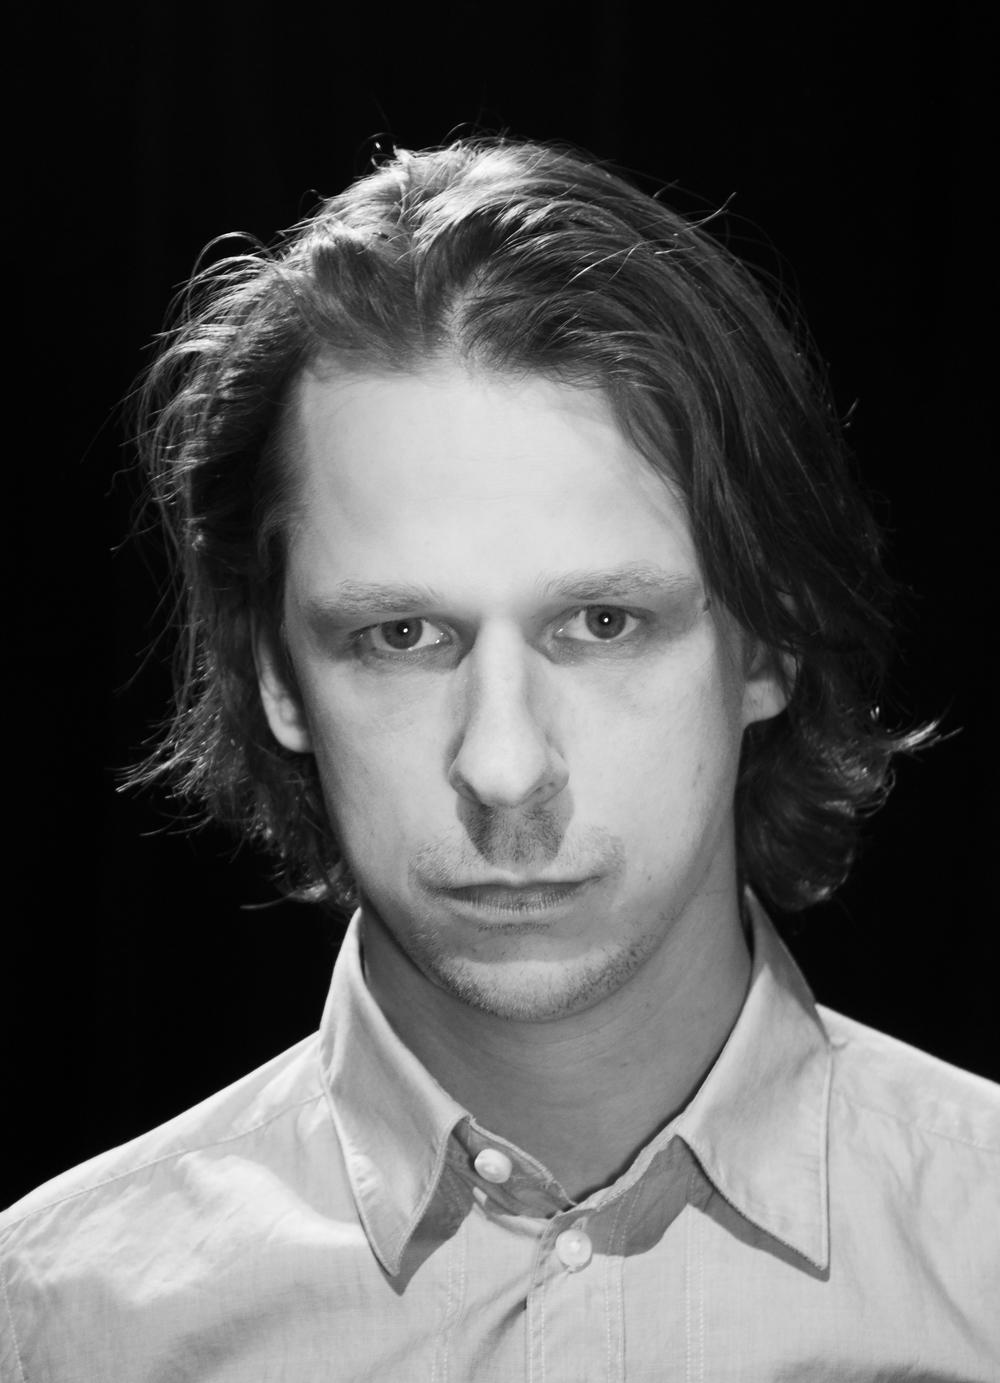 Peter Viitanen